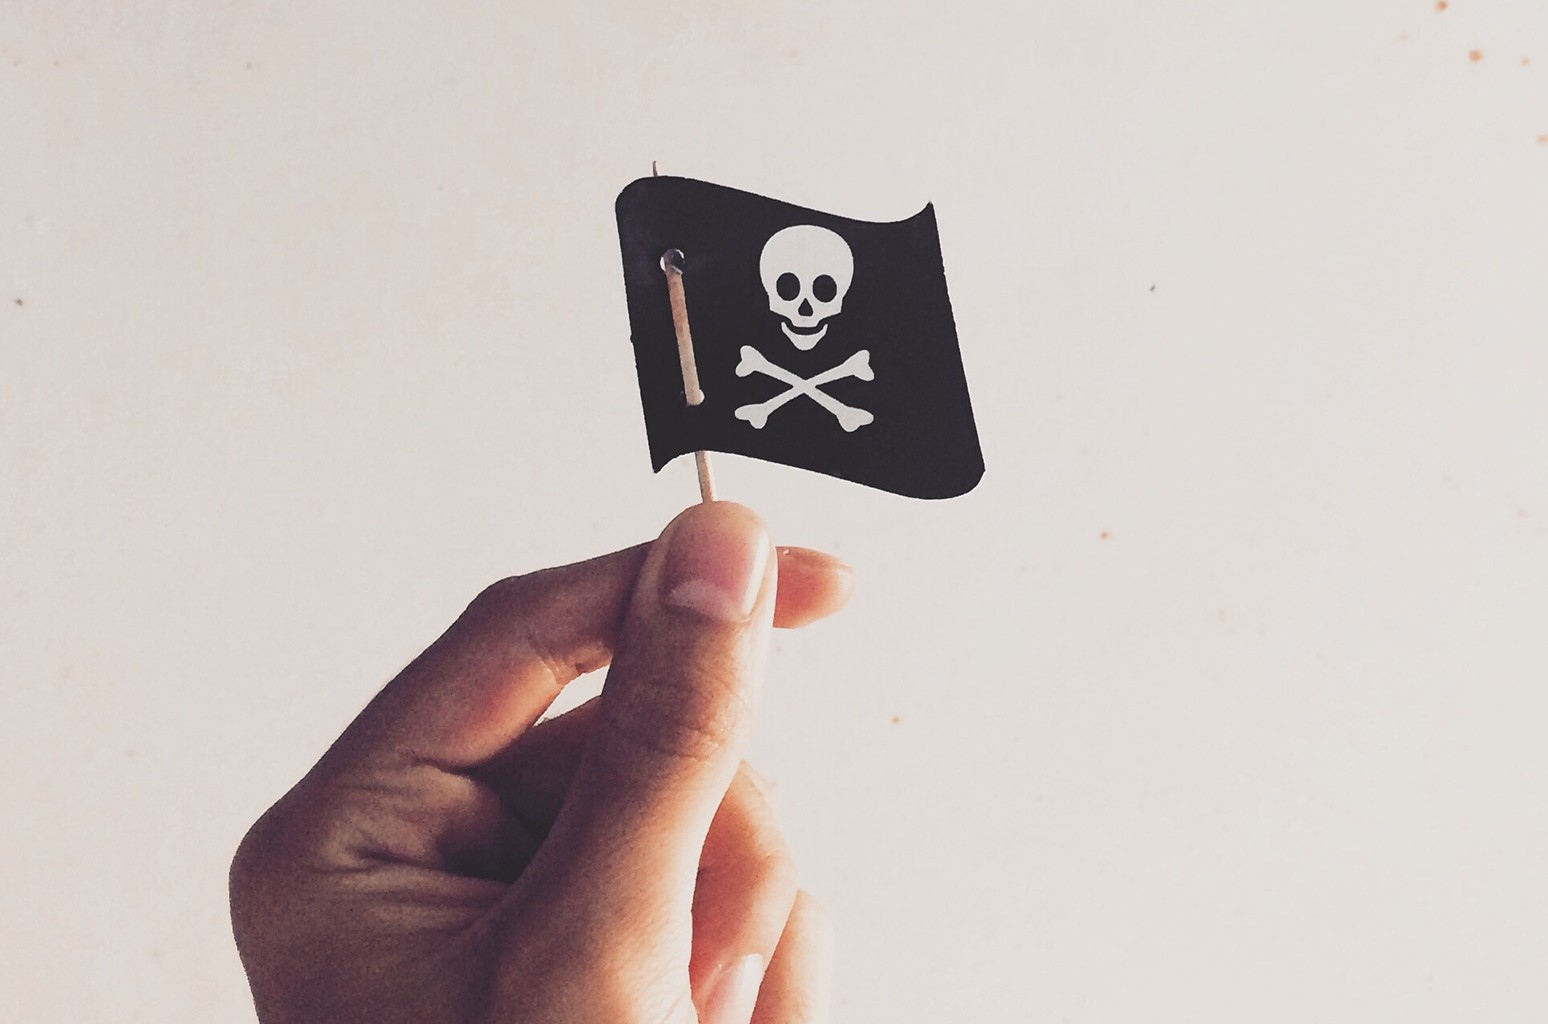 Pirate Flag Biz 2016